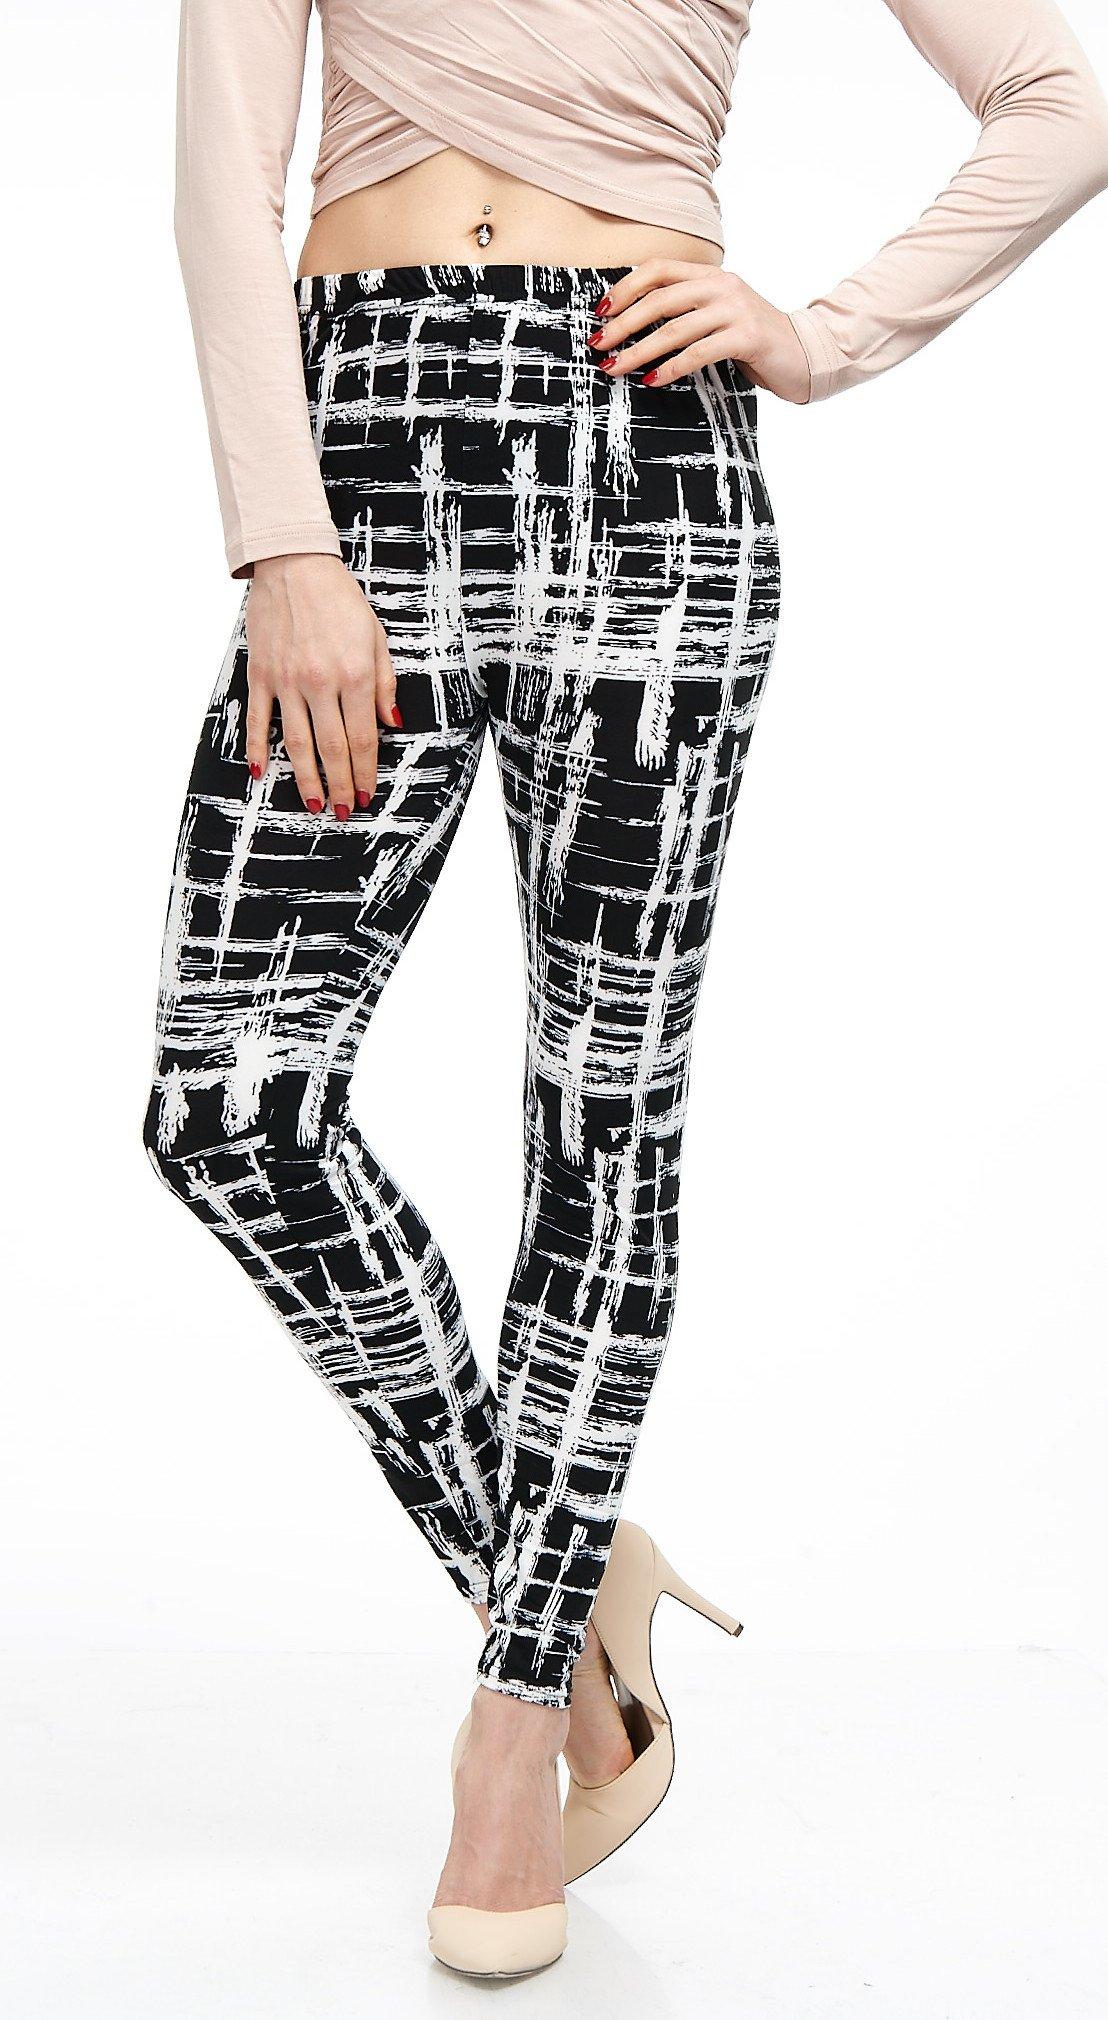 LMB Lush Moda Extra Soft Leggings with Designs- Variety of Prints - 720F Black White Stripes B5 by LMB (Image #4)